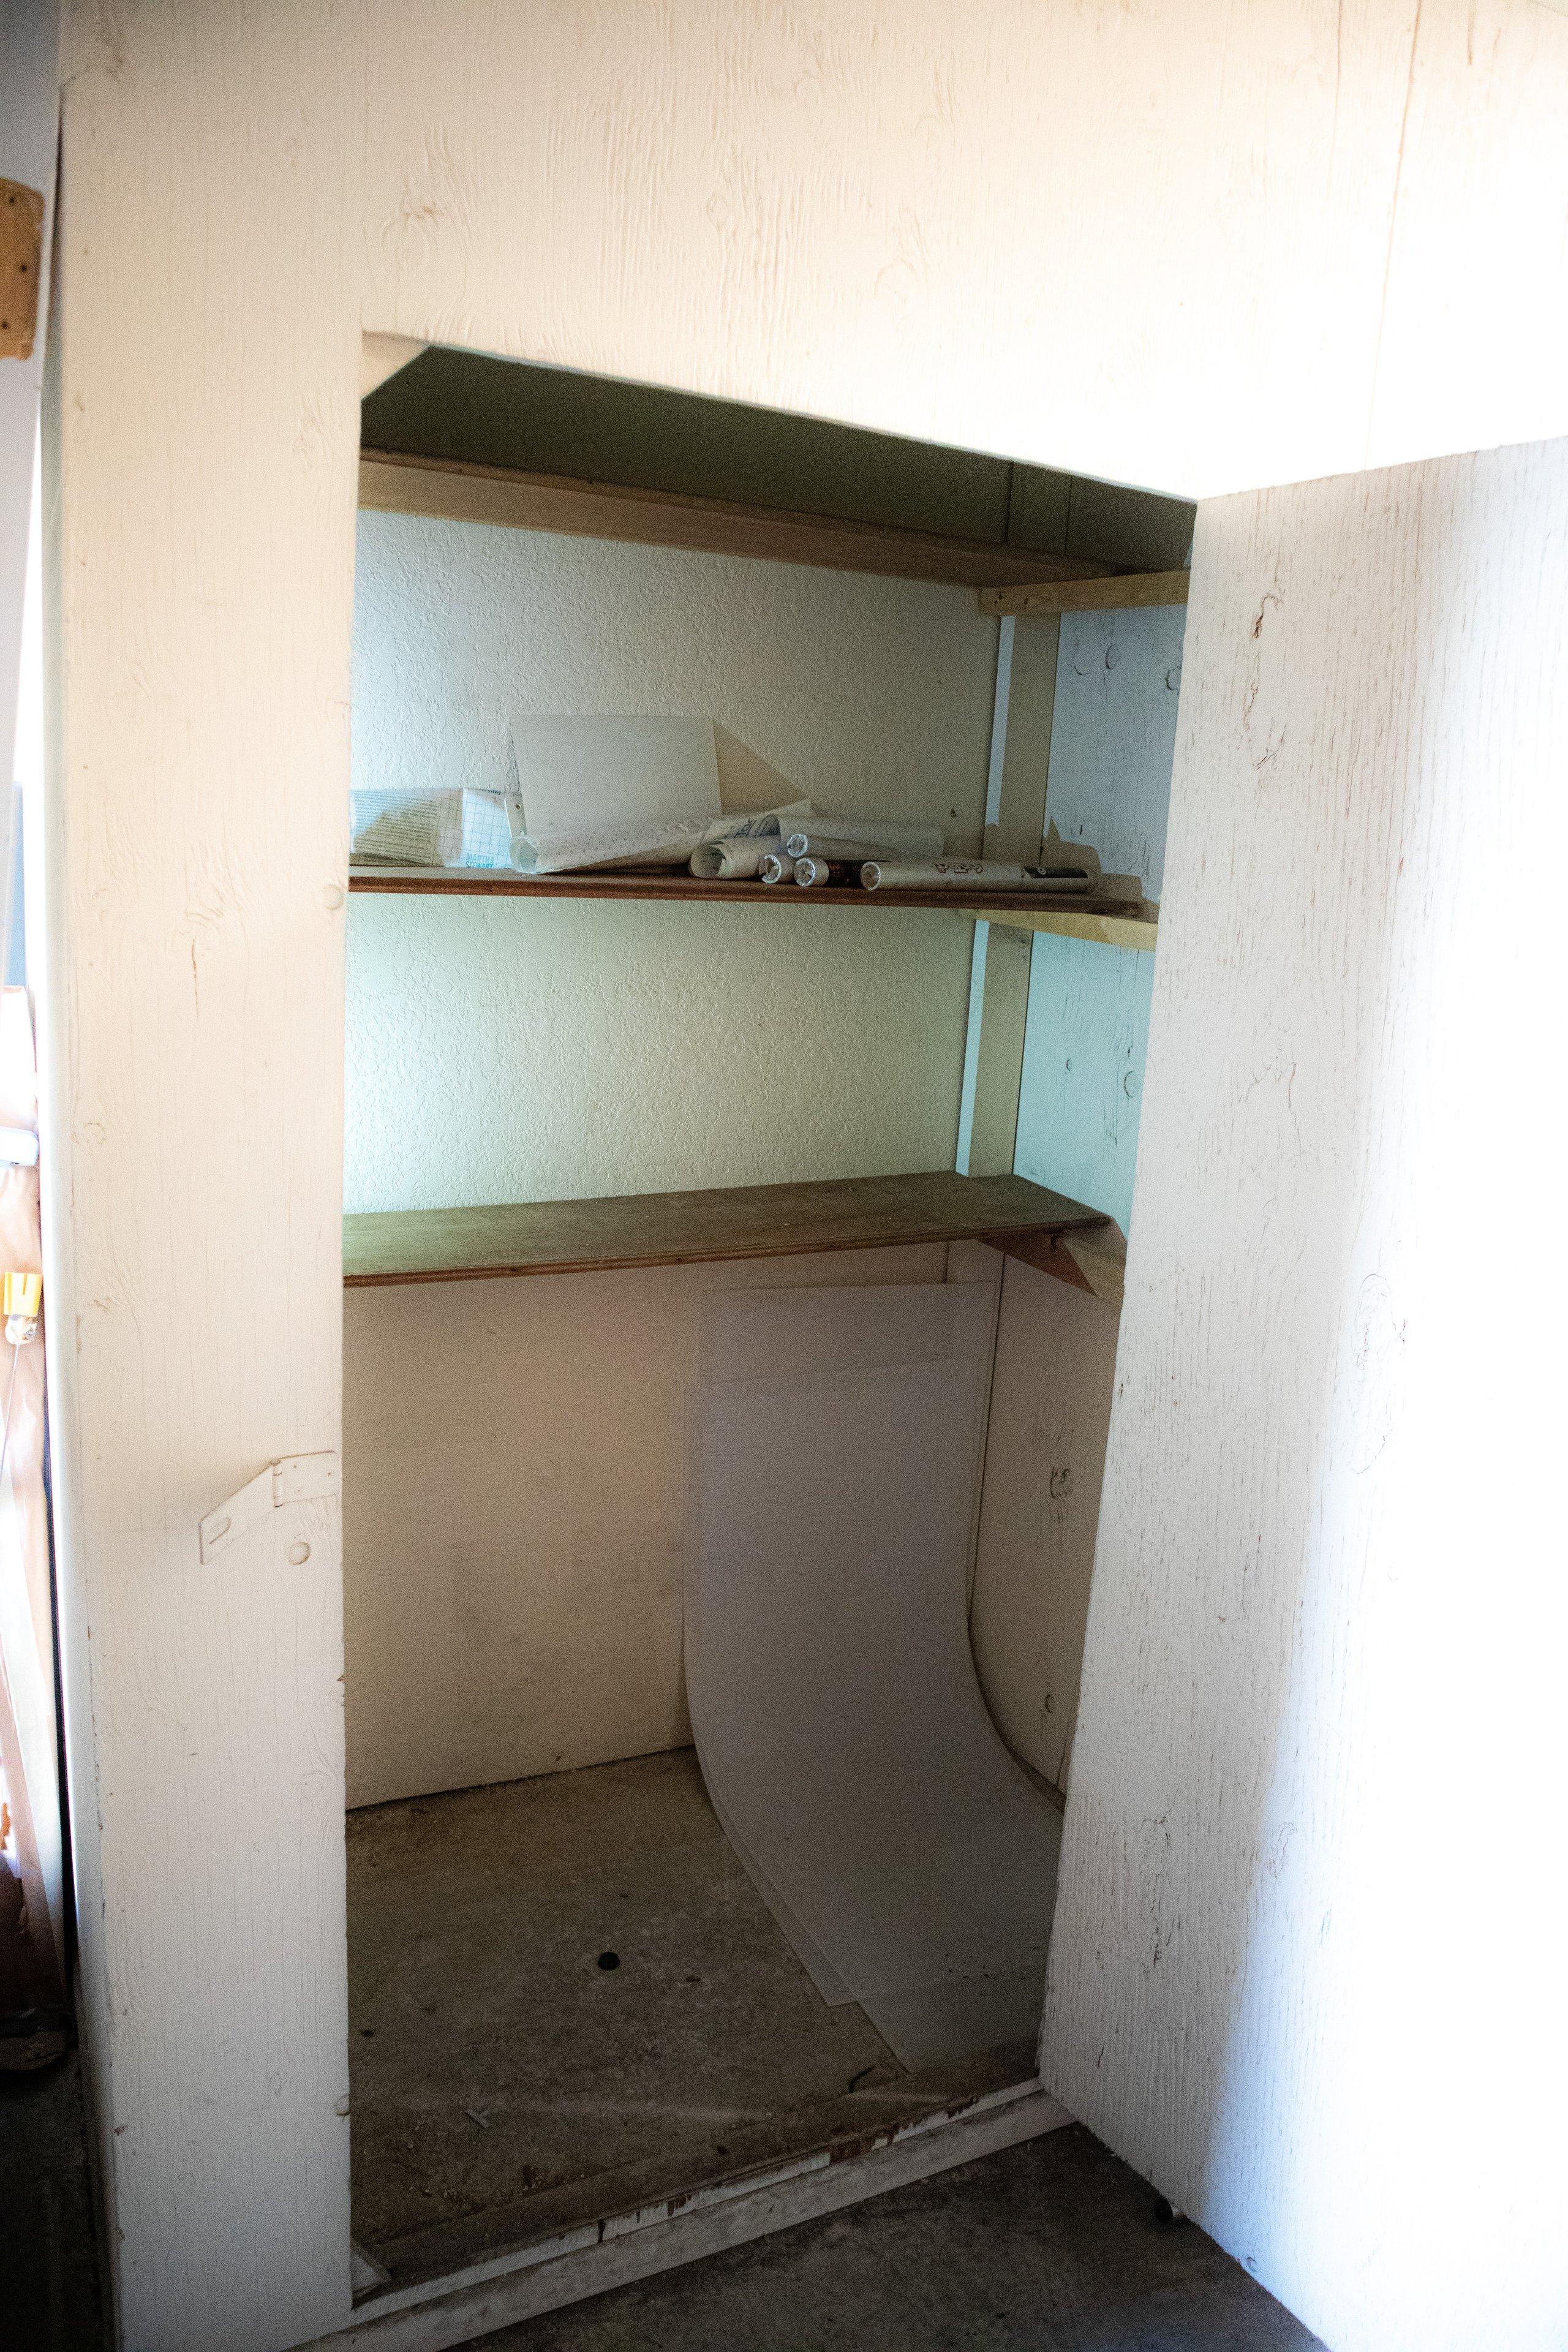 4x6 Self Storage Unit self storage unit